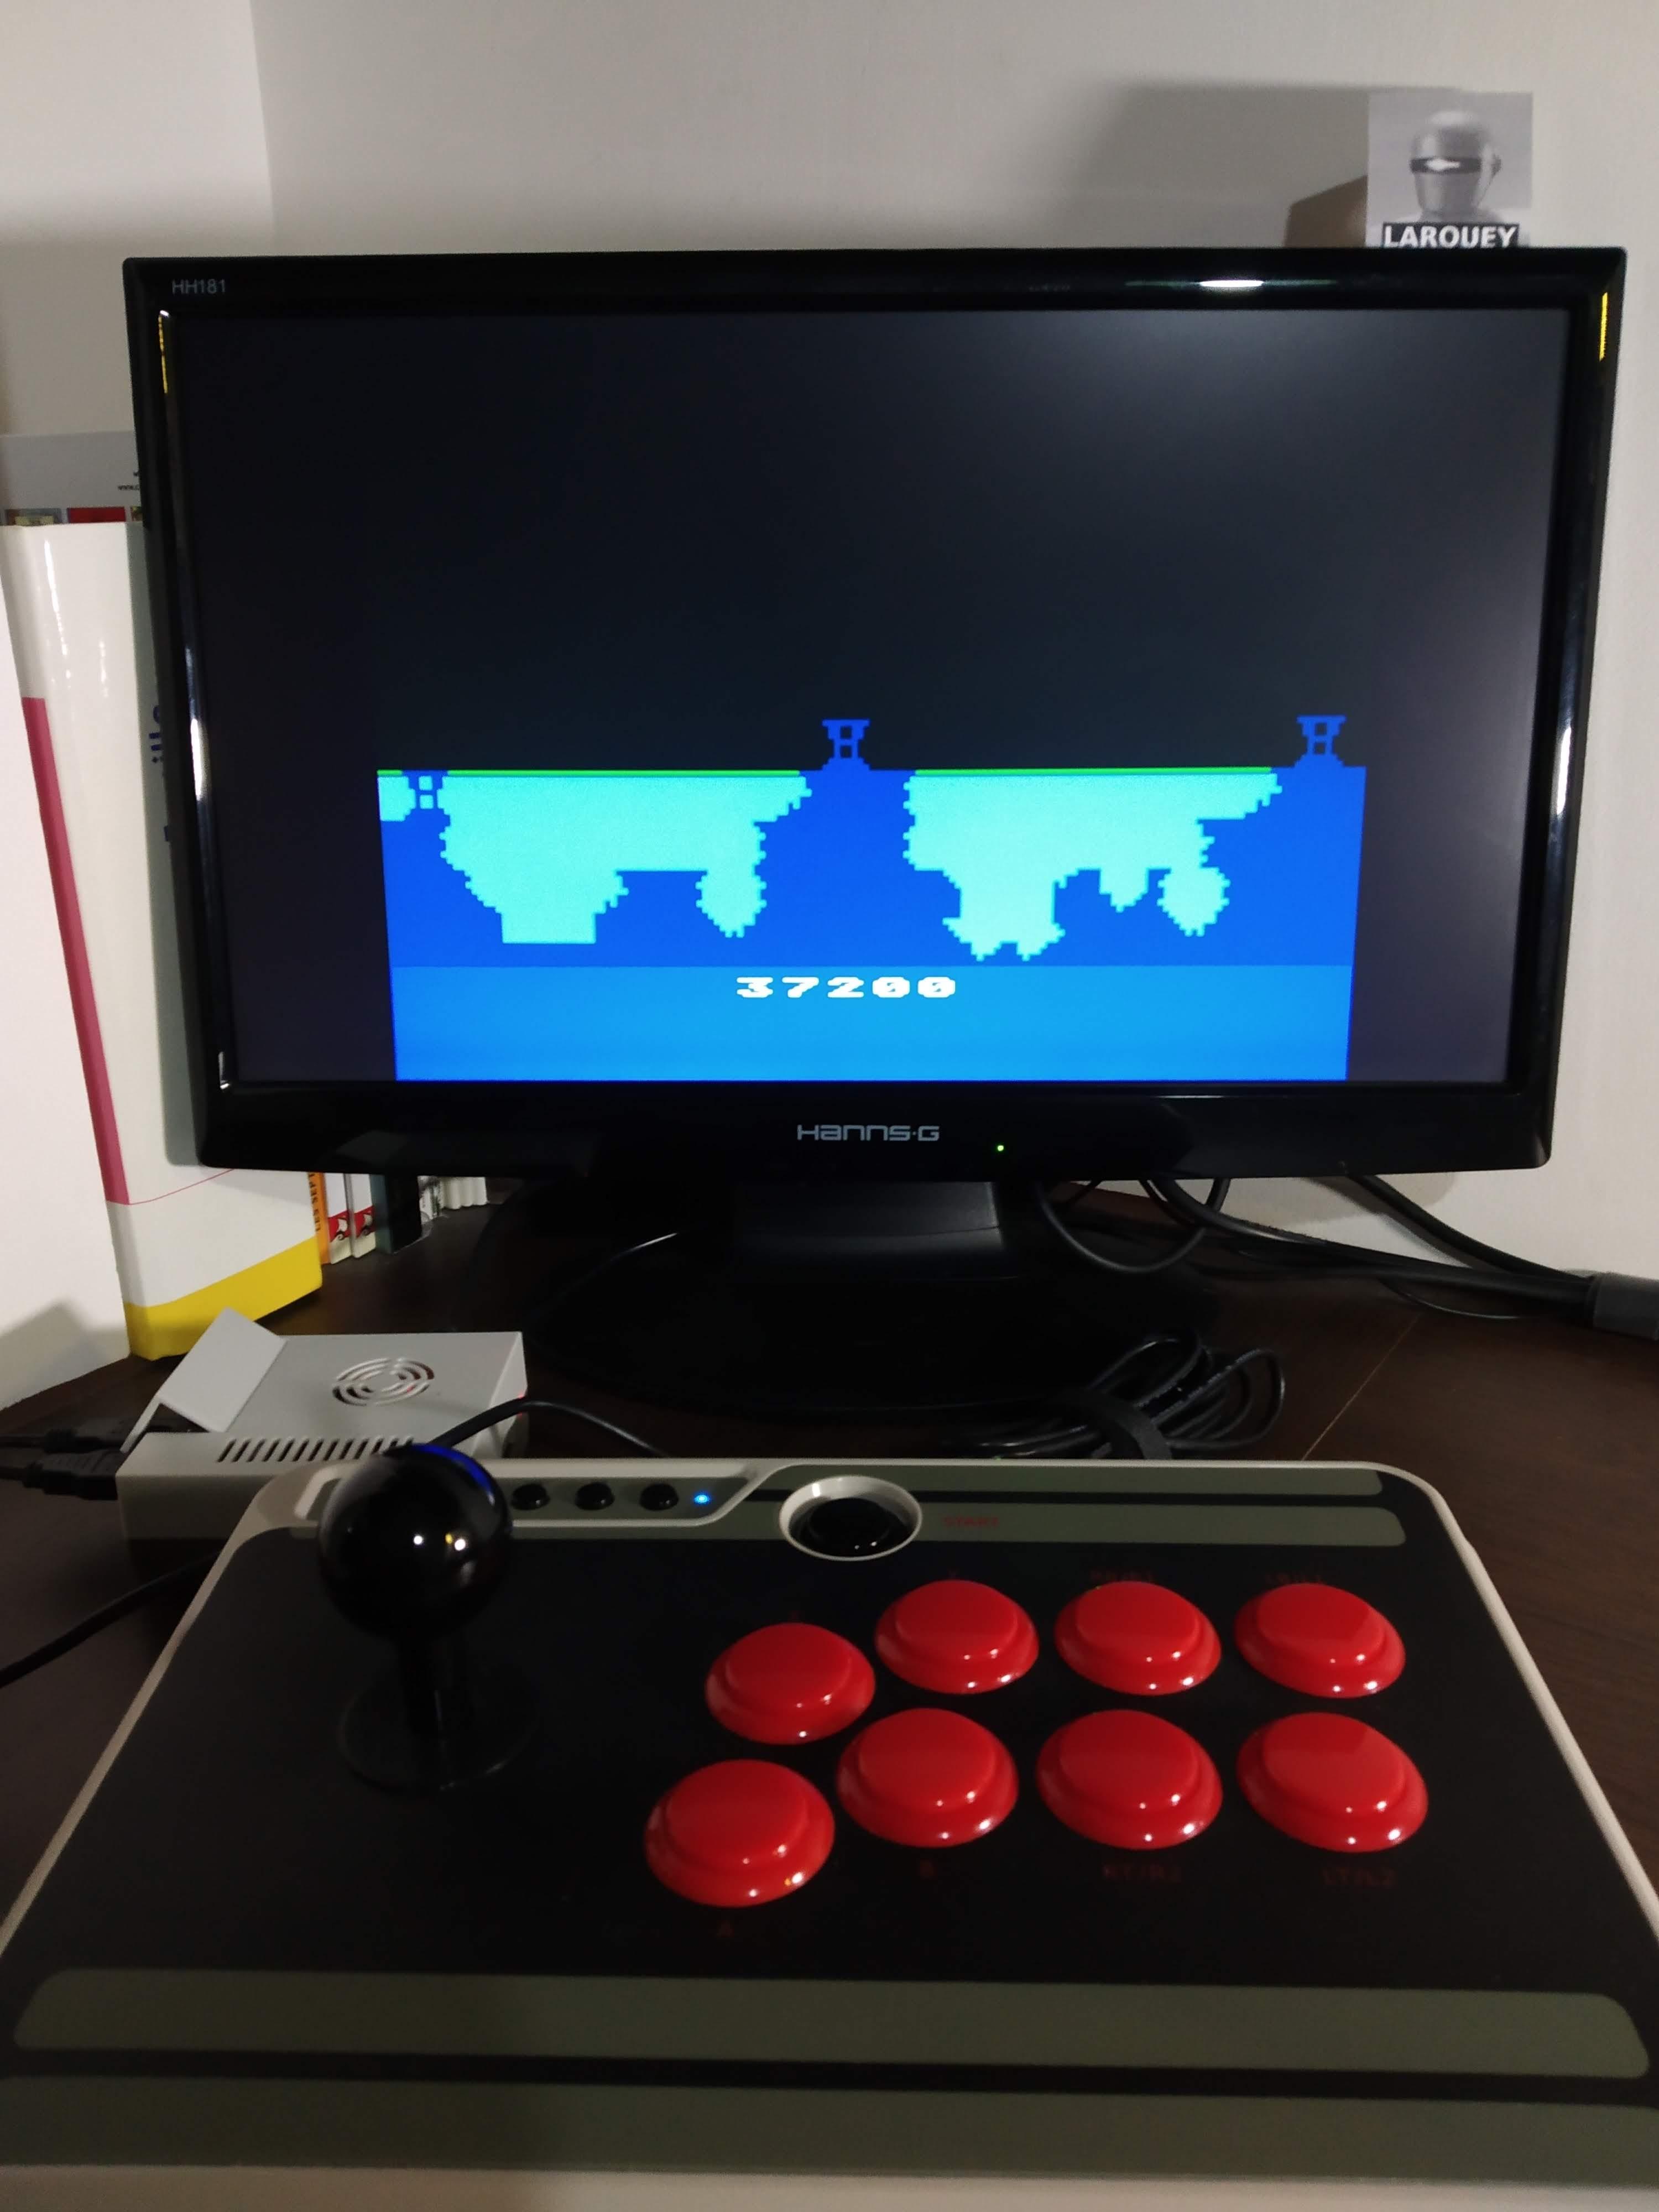 Larquey: Atlantis [Hard] (Atari 400/800/XL/XE Emulated) 37,200 points on 2019-11-30 13:19:54